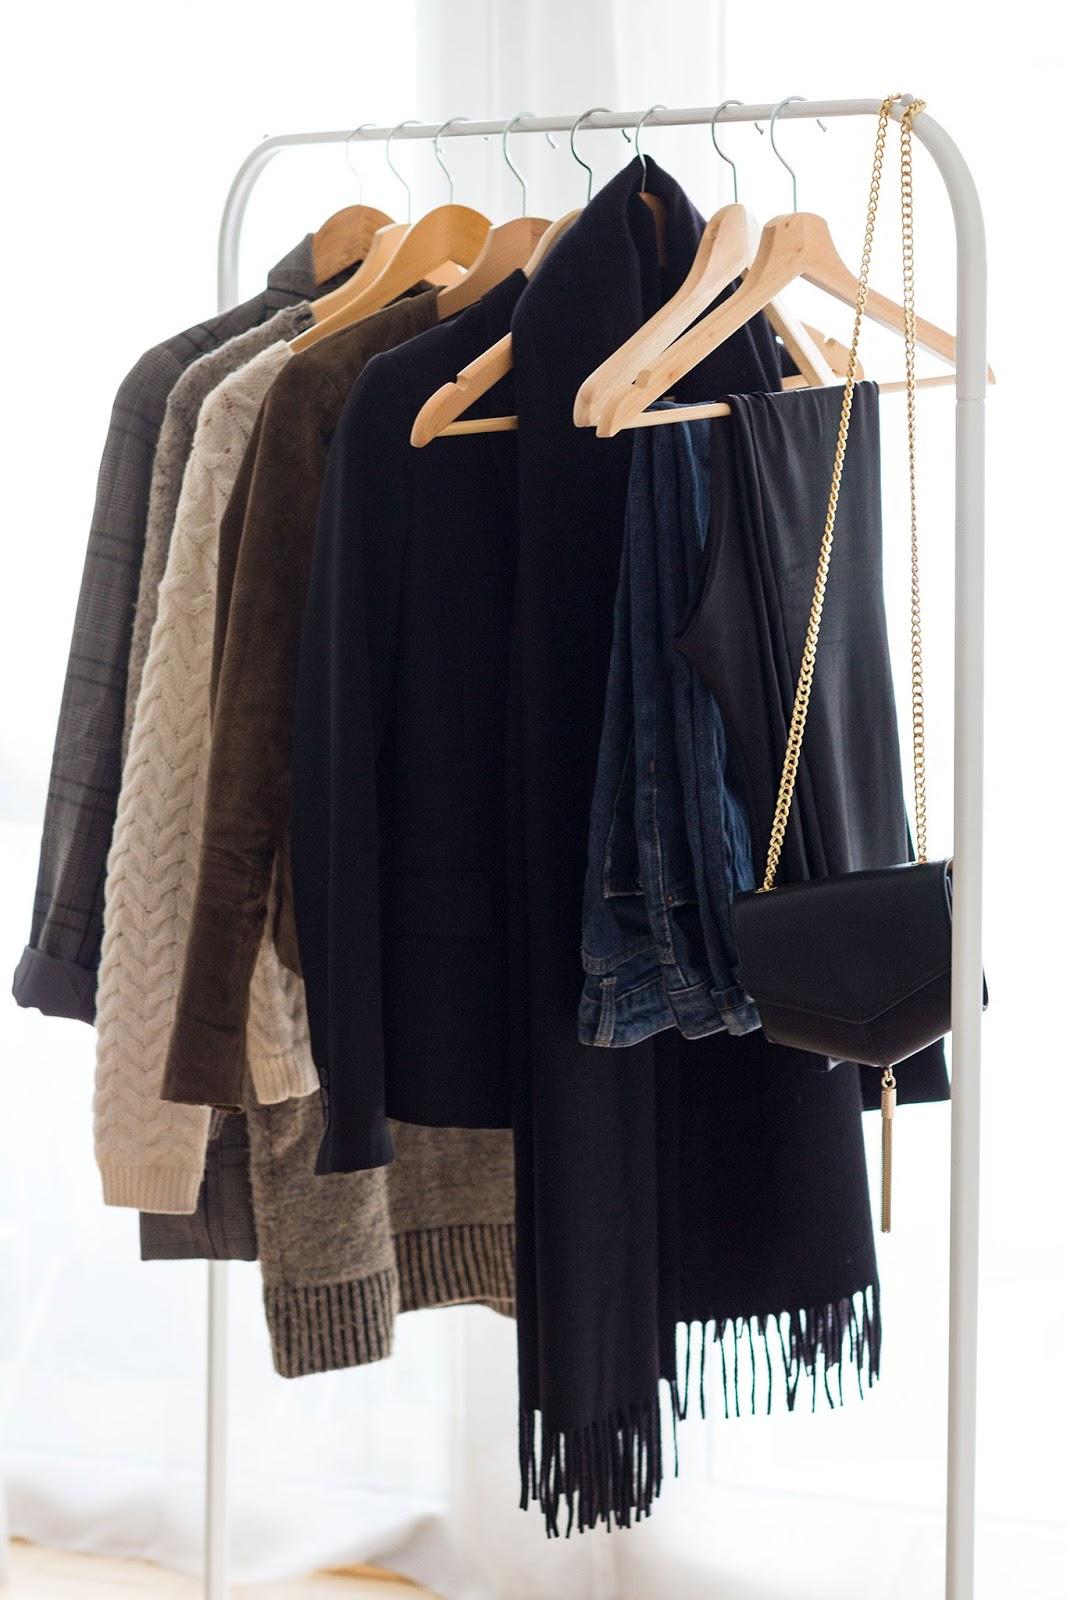 Fashion | Meine Herbst Capsule Wardrobe | www.sparklyinspiration.com